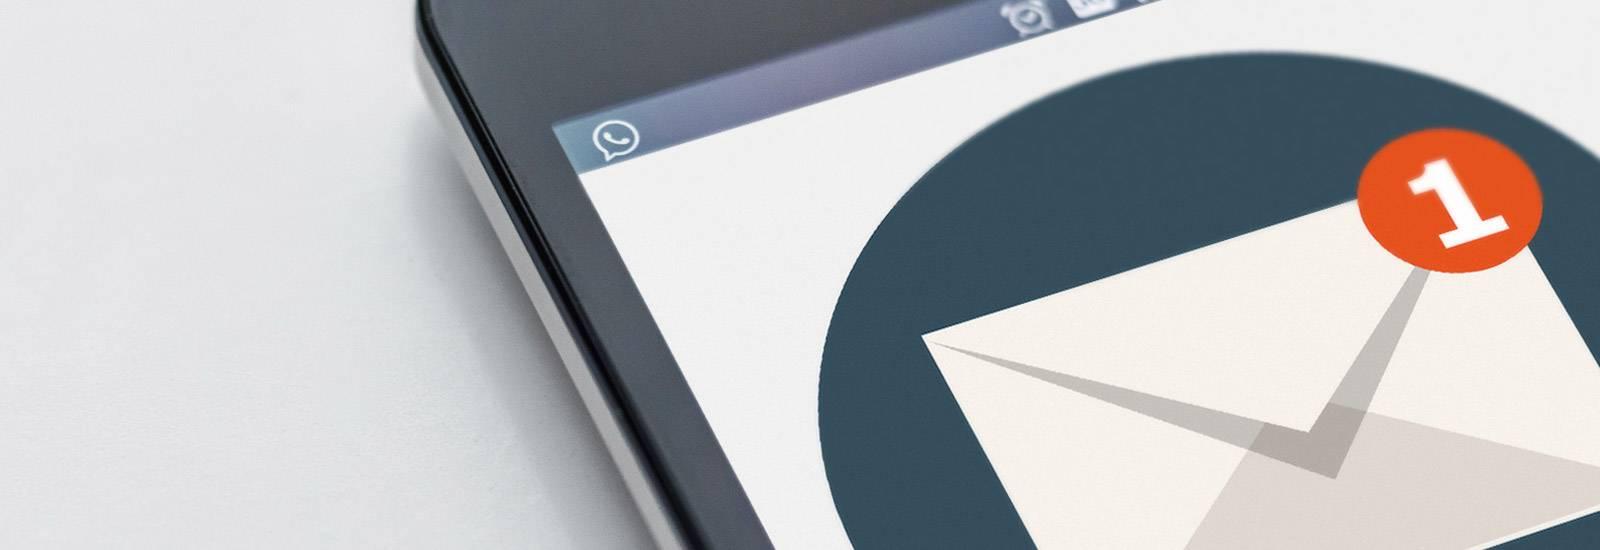 Header-Email-Design-Canterbury-Kent.jpg